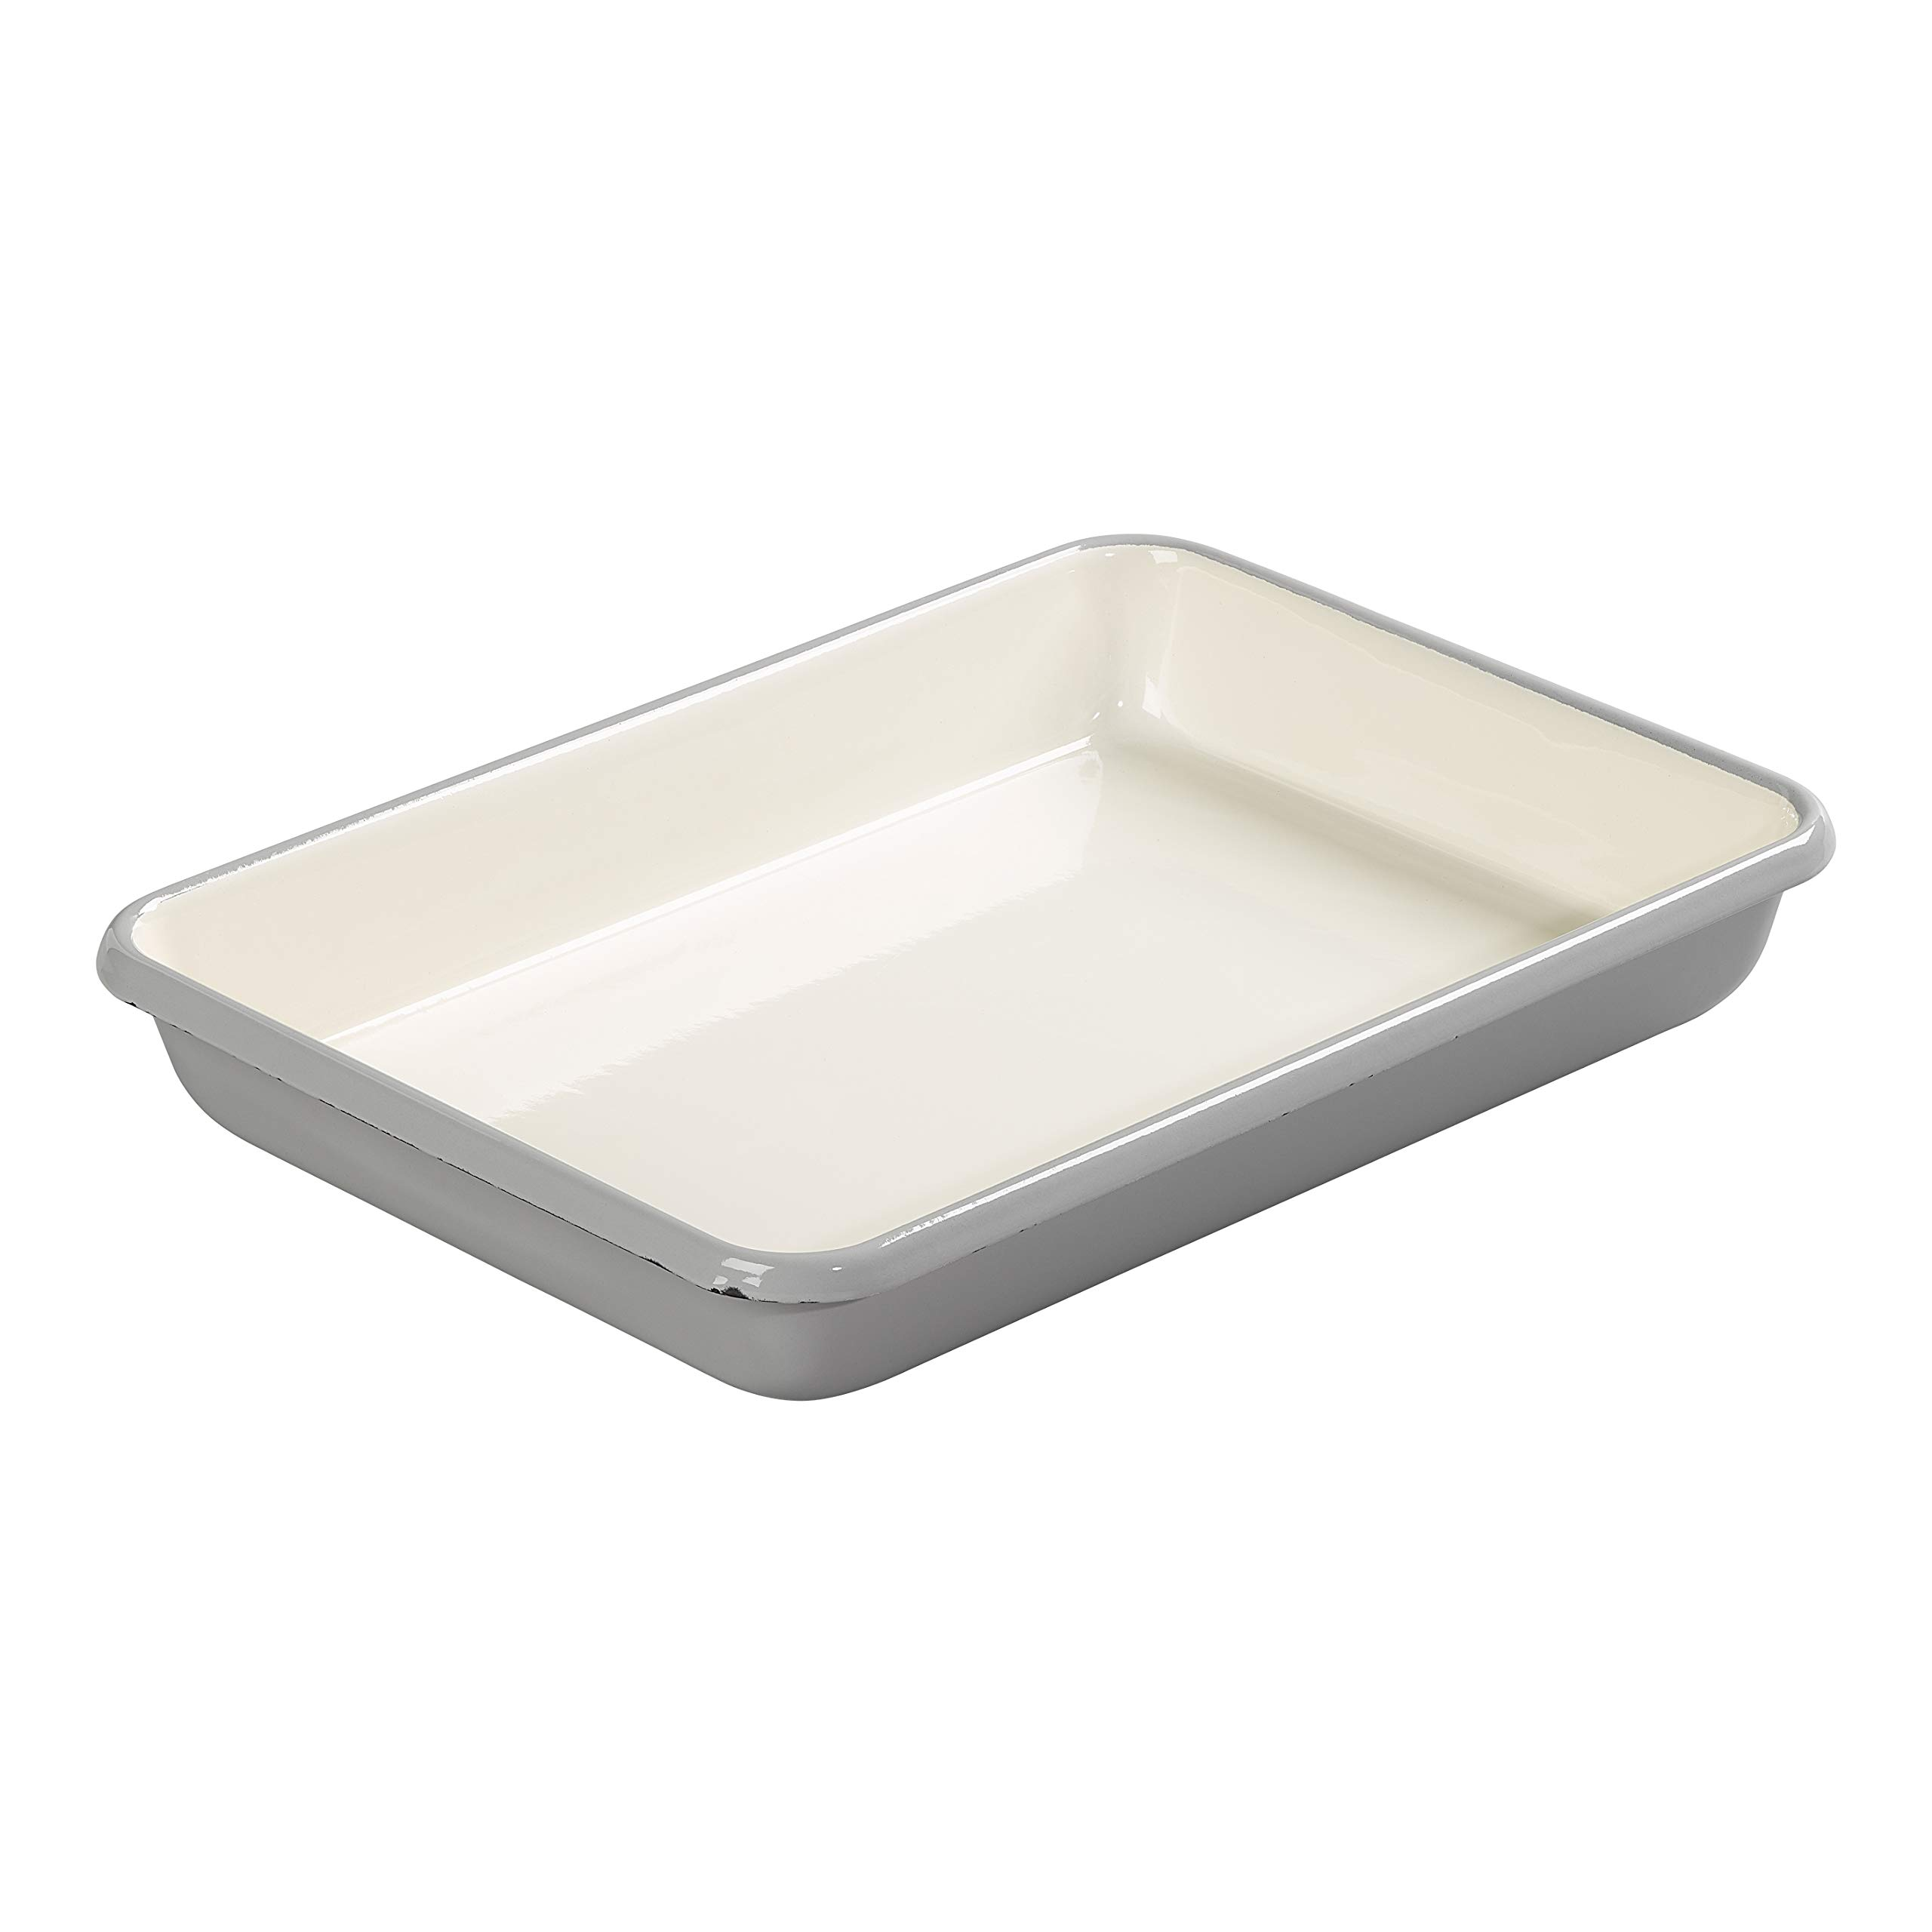 Tala Originals 10B14158 Enamel Bakeware, Cool Grey